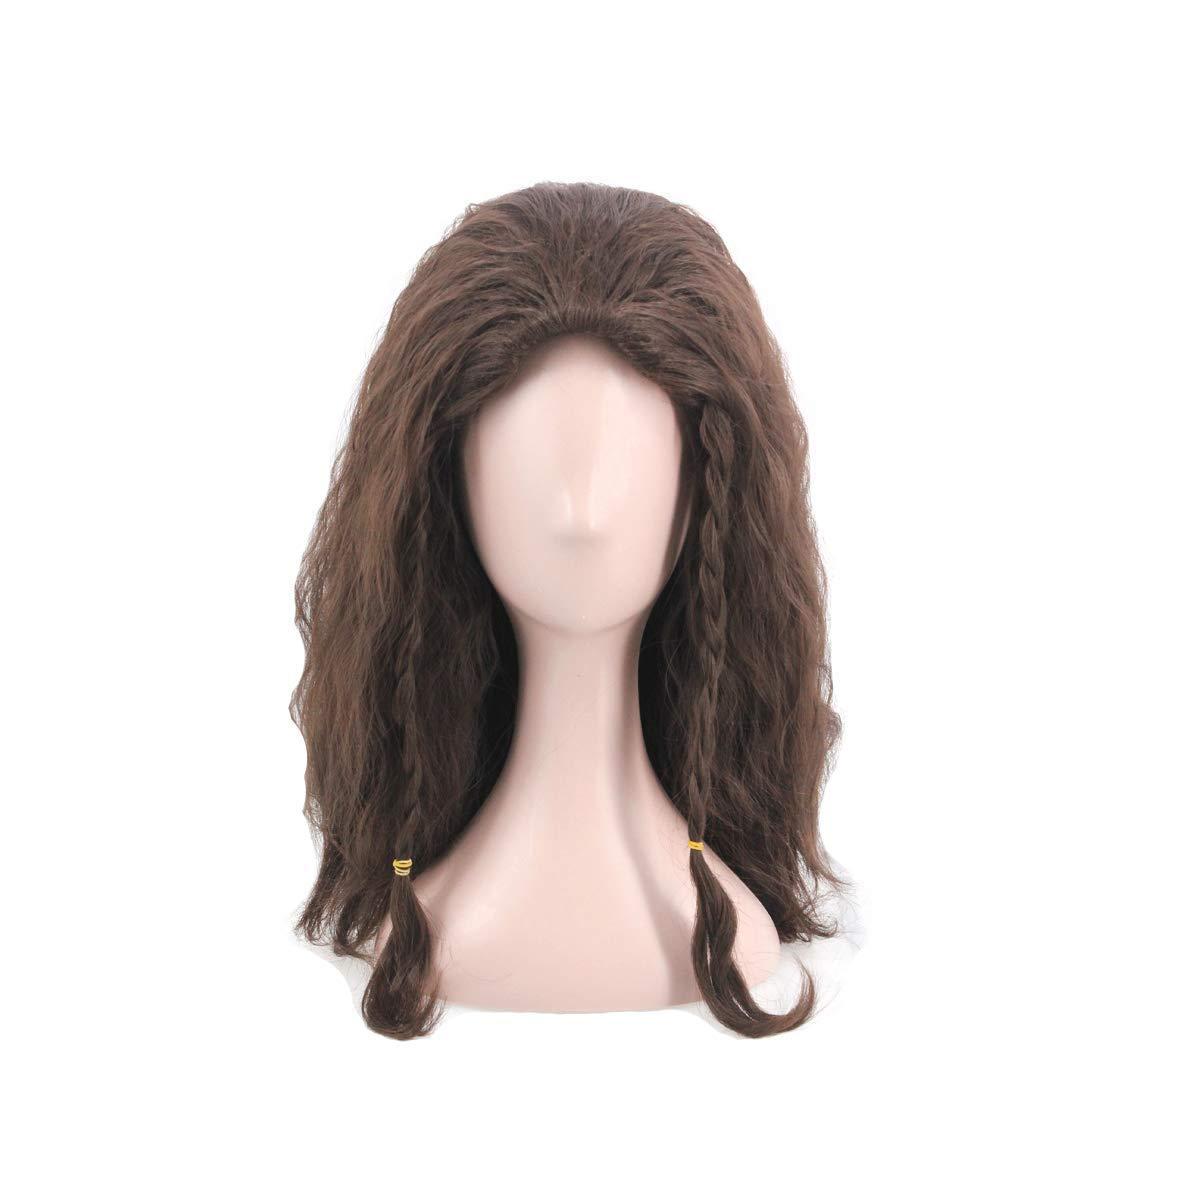 Man's Short Fluffy Cosplay Wig Haollween Wig for Movie (Dark Brown) by SpeedBeauty